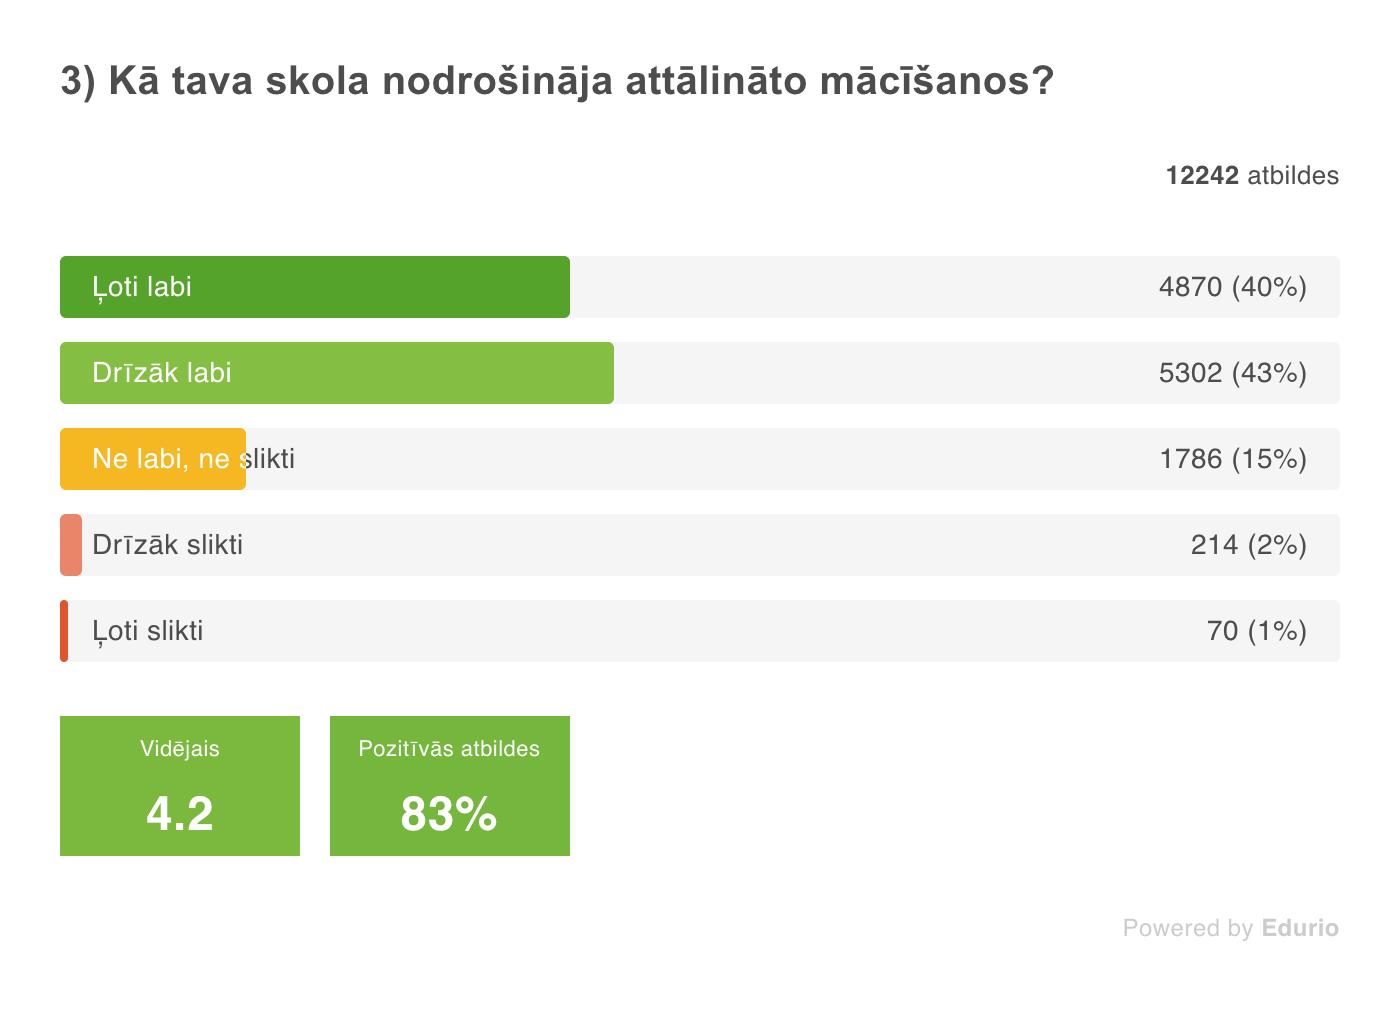 IZM_end_student_3_top_ka_nodrosinaja_macisanos